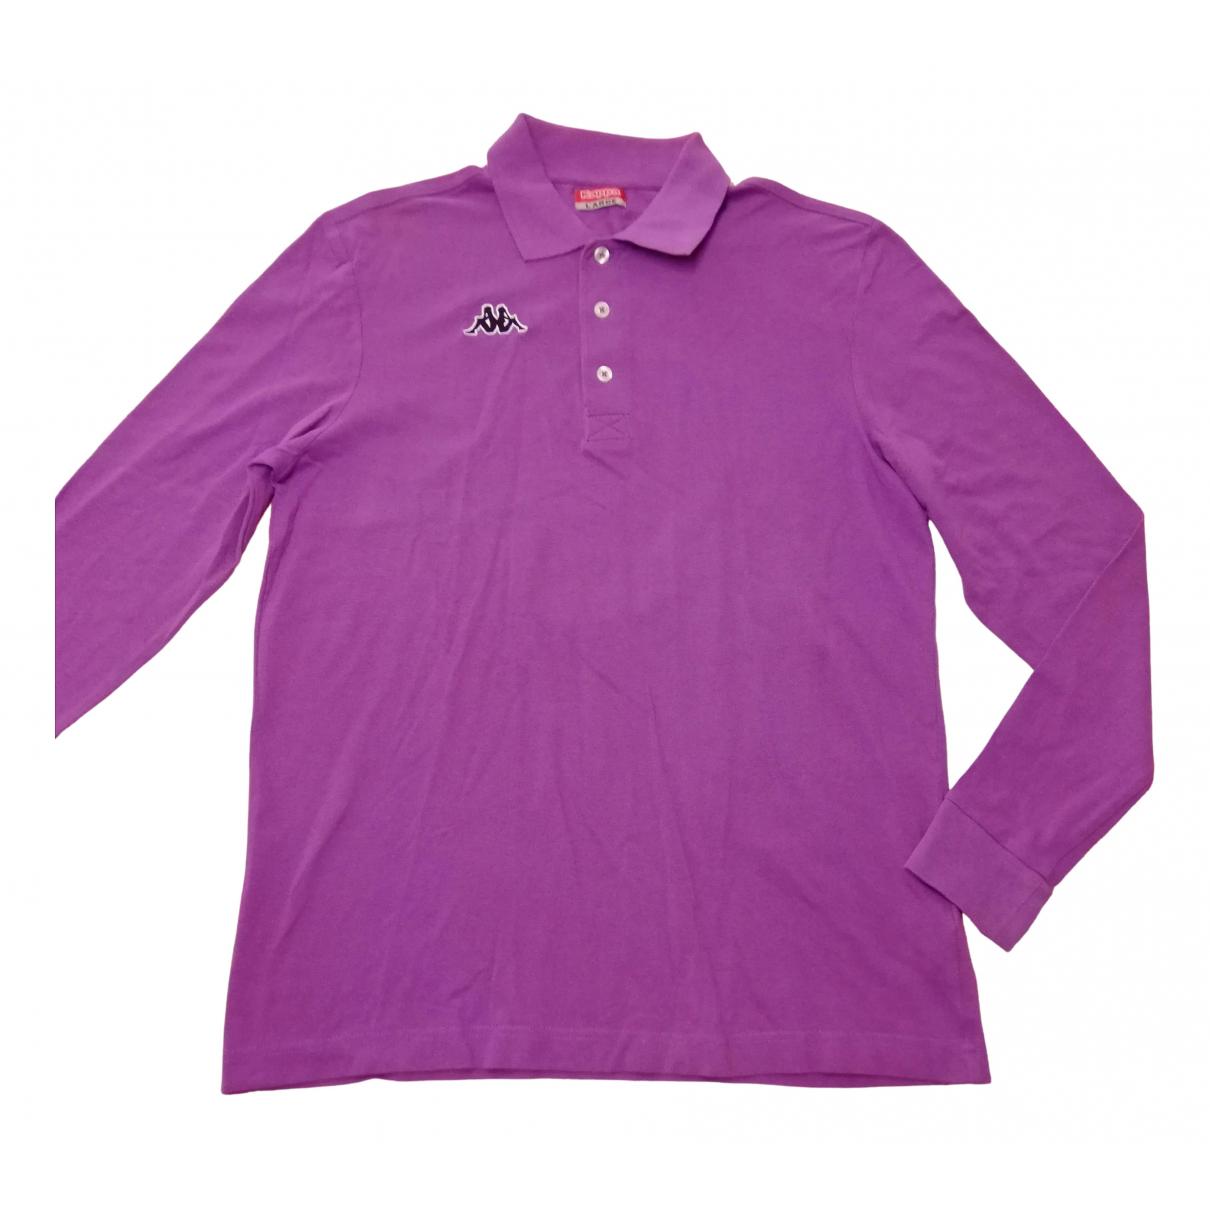 Kappa \N Poloshirts in  Lila Baumwolle